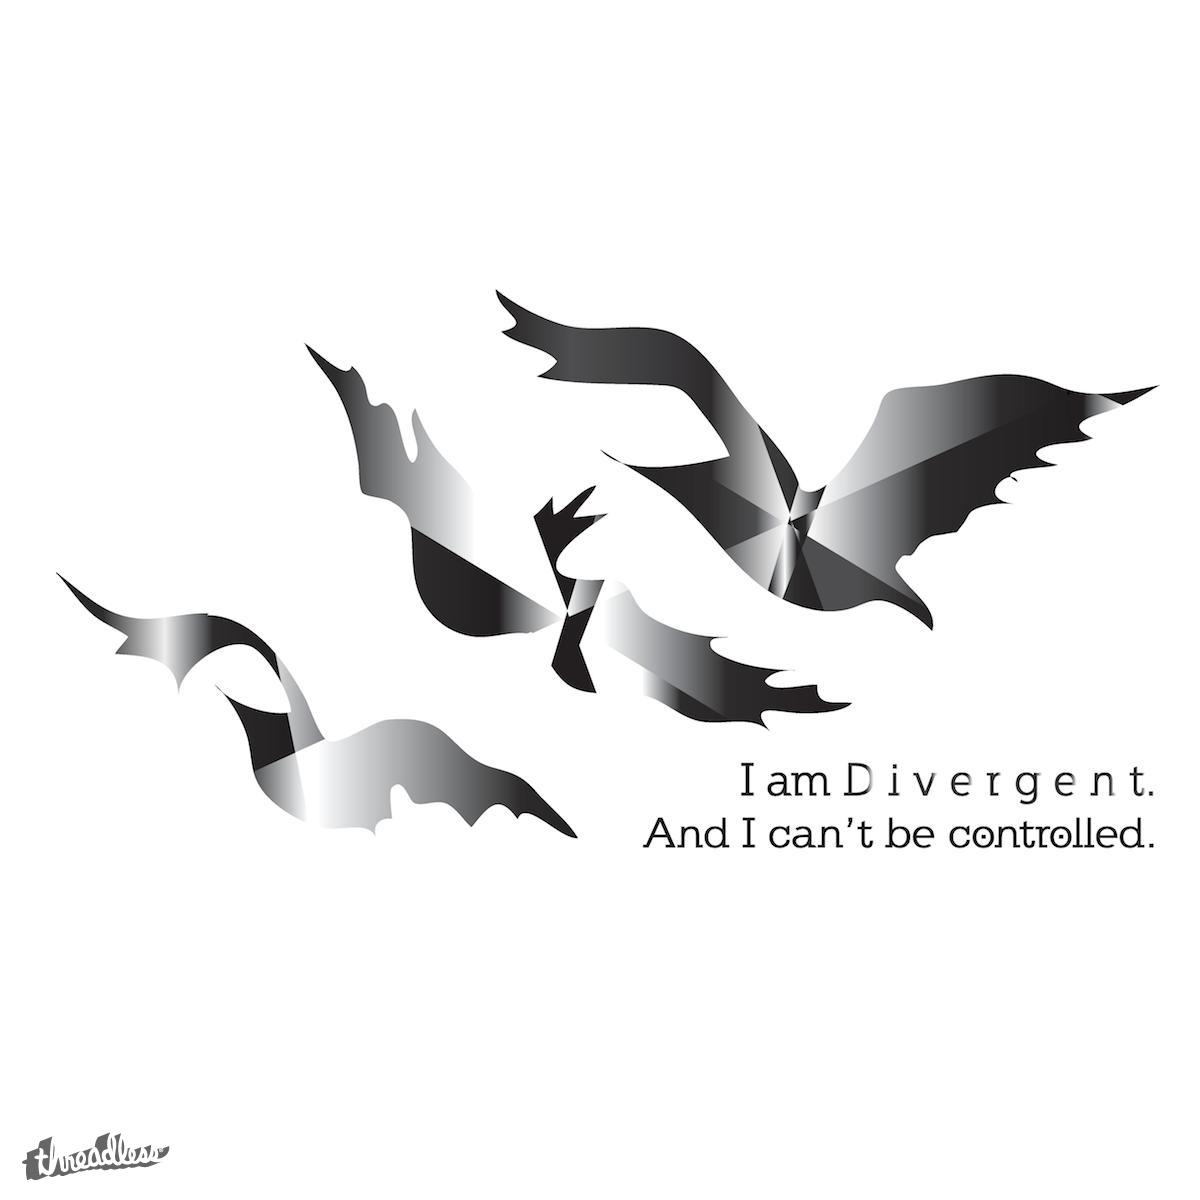 Divergent birds images galleries with for Divergent tris bird tattoo